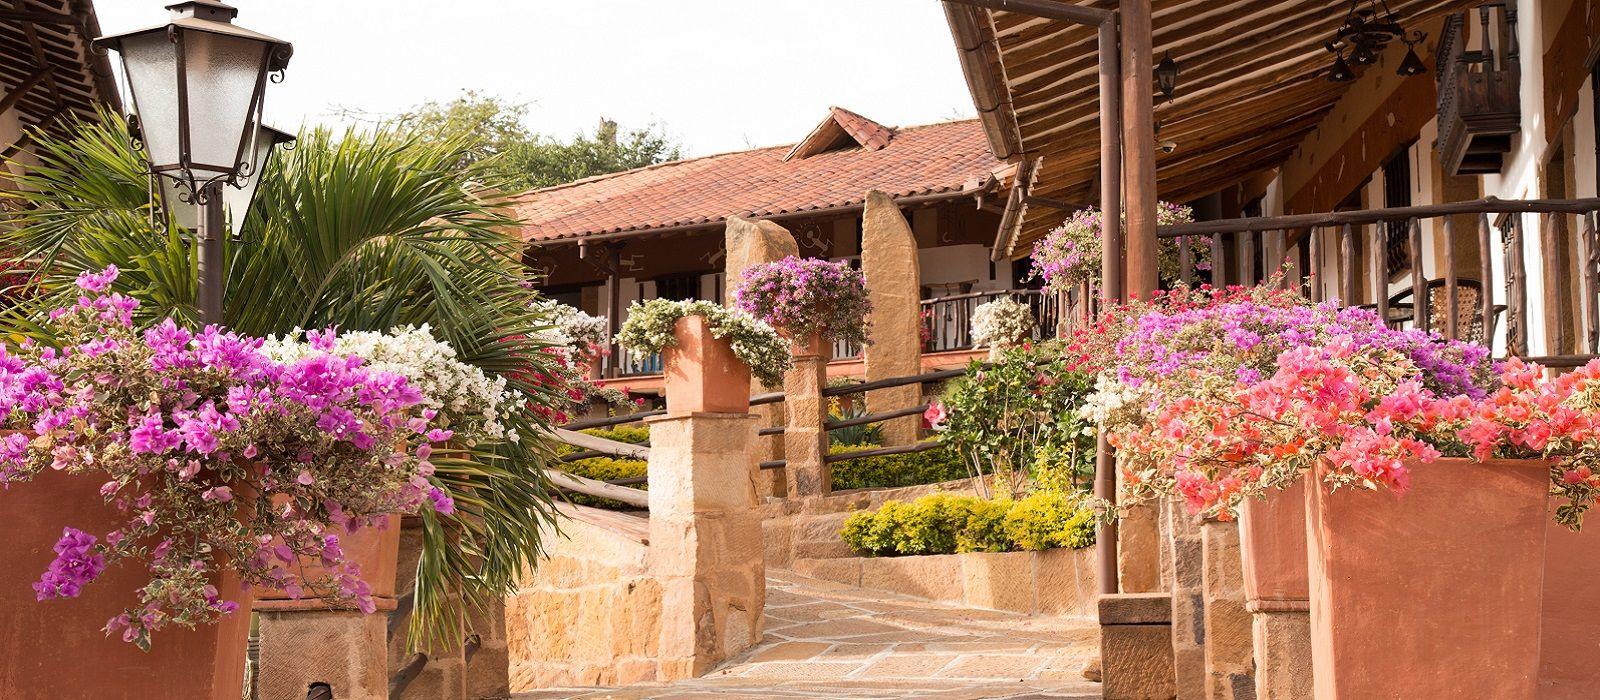 Hotel Hicasua  Colombia